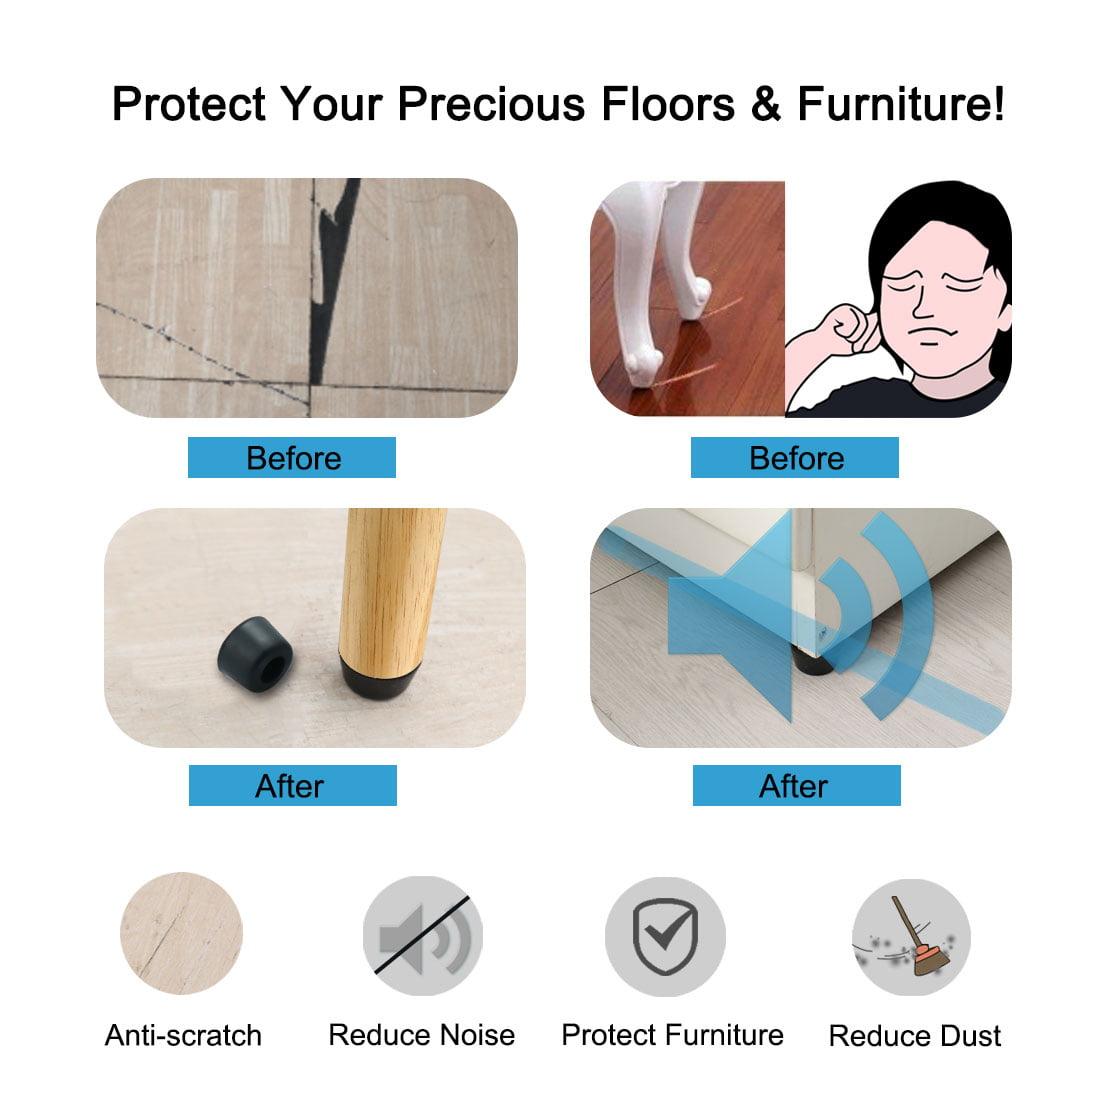 32pcs Rubber Feet Bumper Speaker Floor Protector for Desk Leg Pad, D14x12xH9mm - image 4 of 7